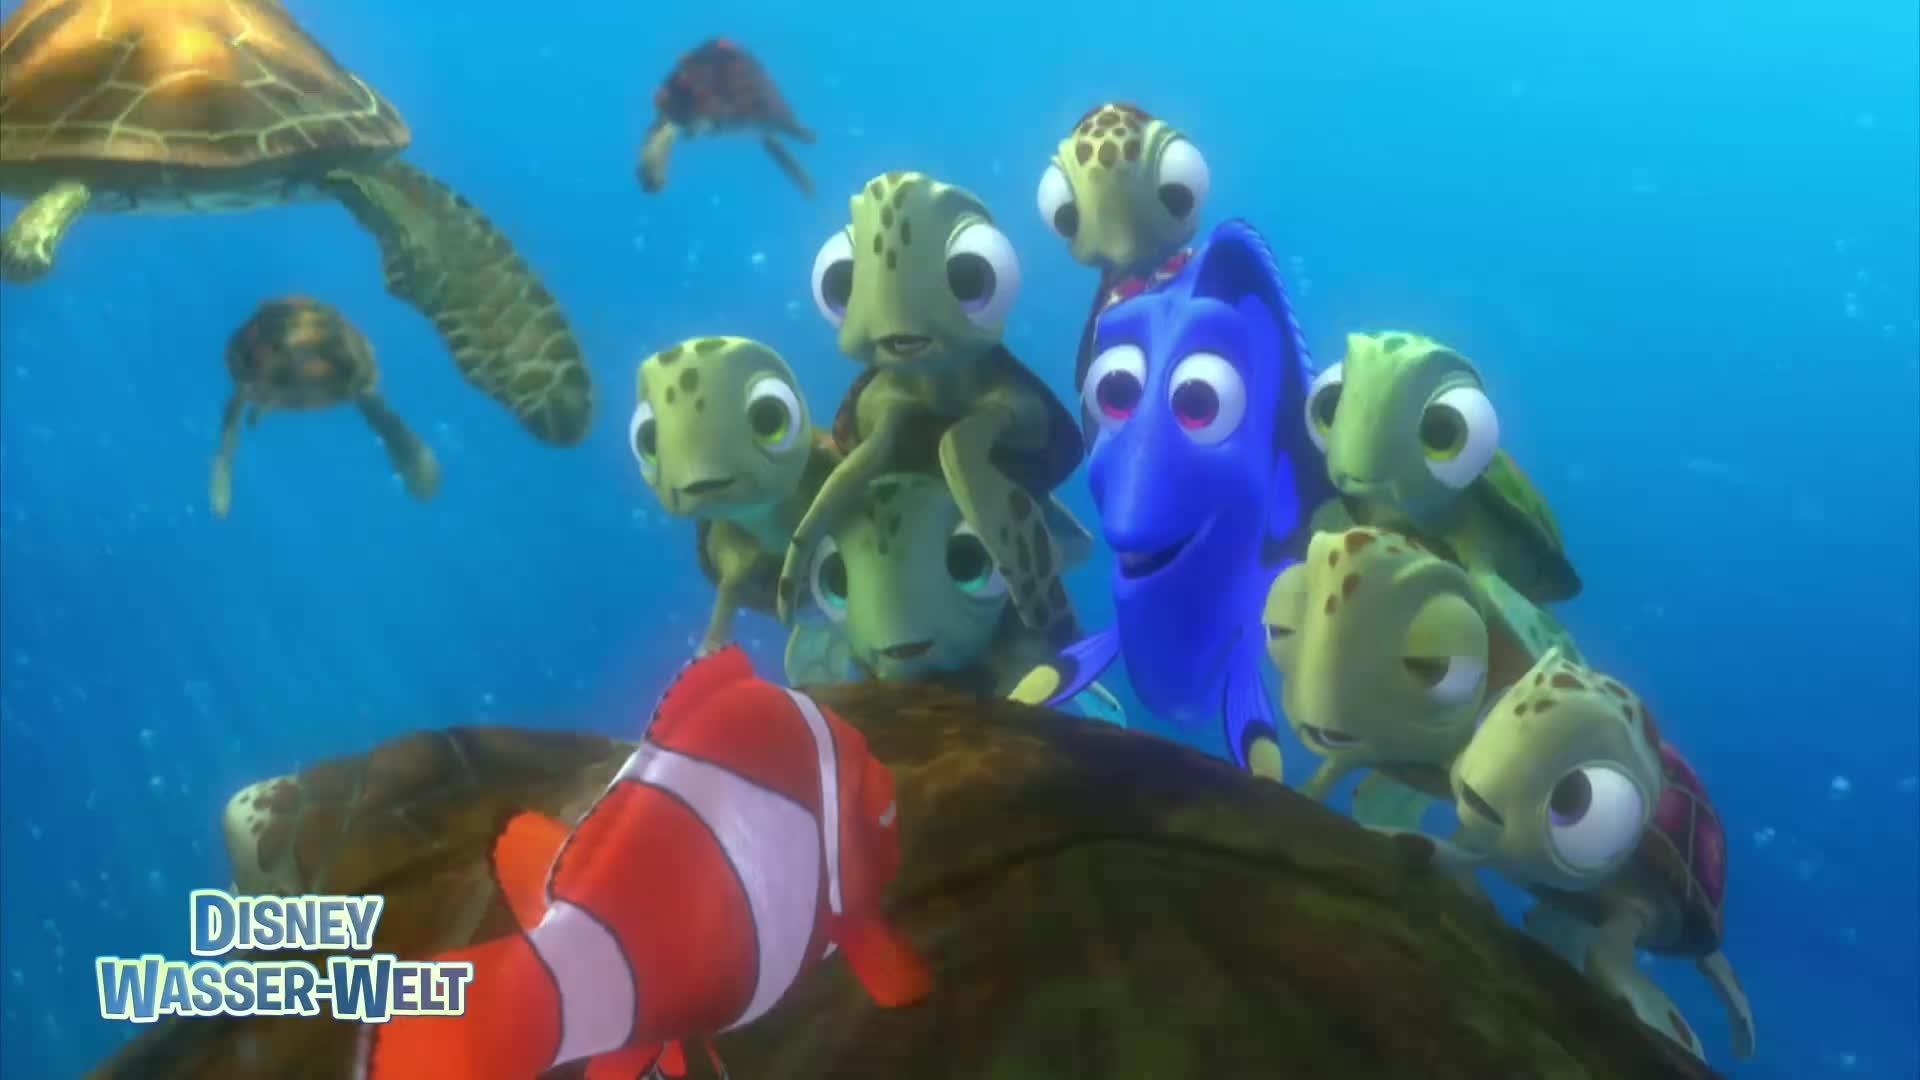 Disney Wasser Welt September Trailer